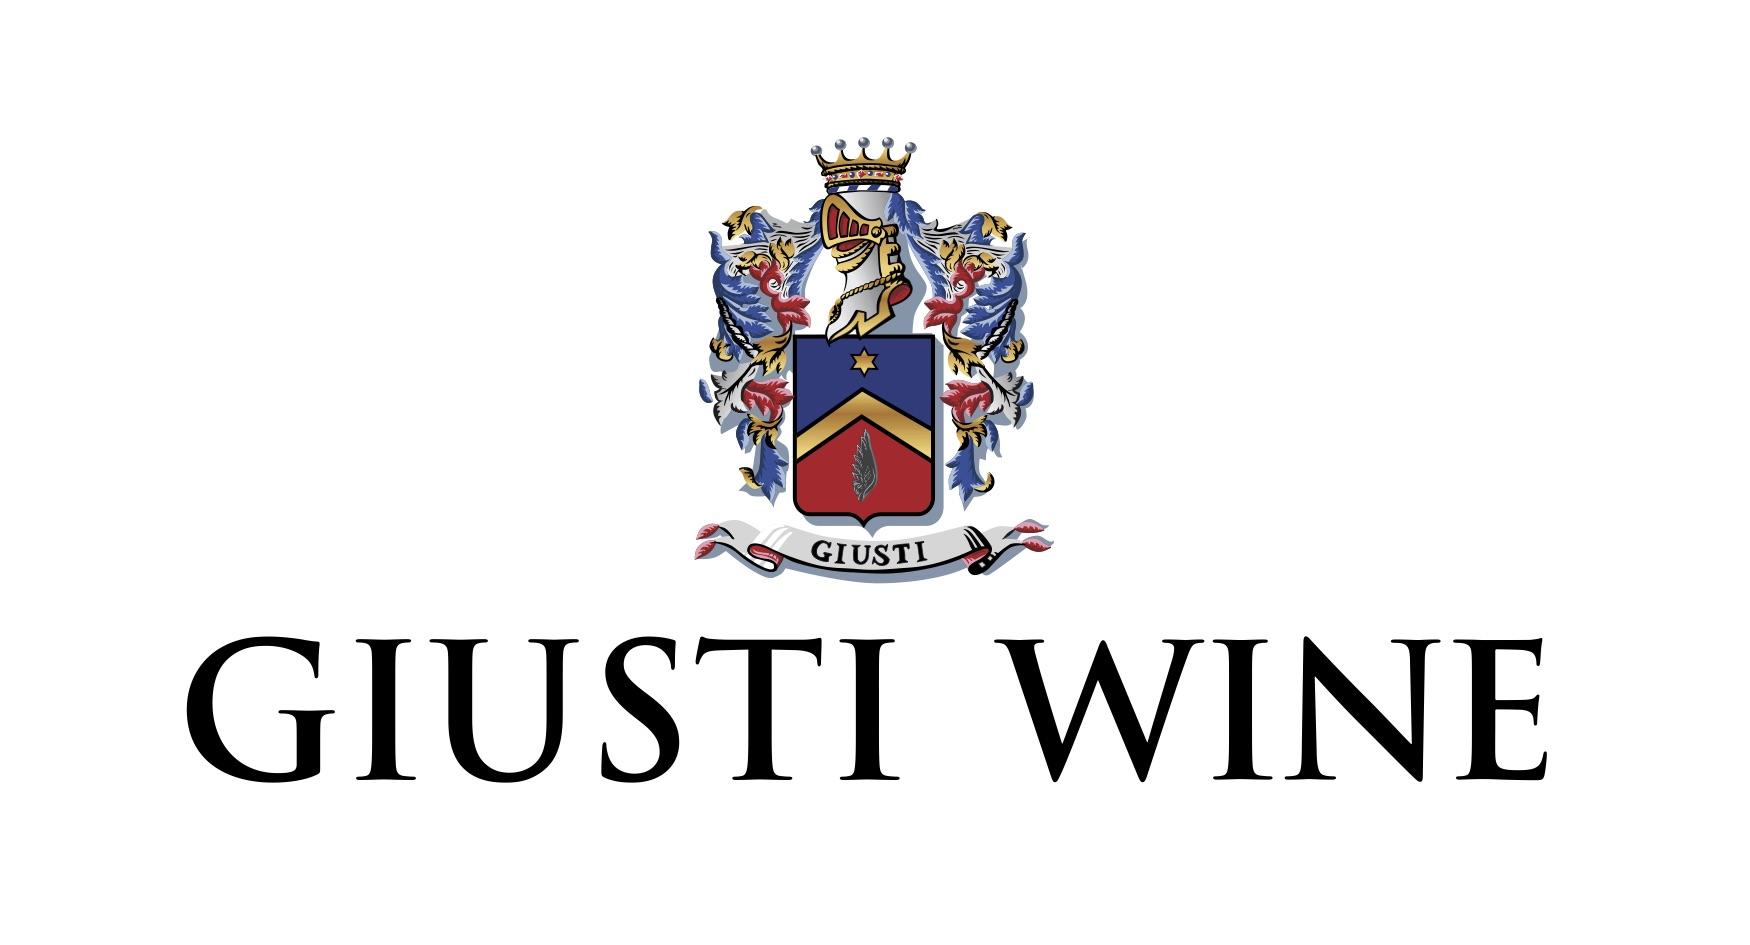 GIUSTI WINE